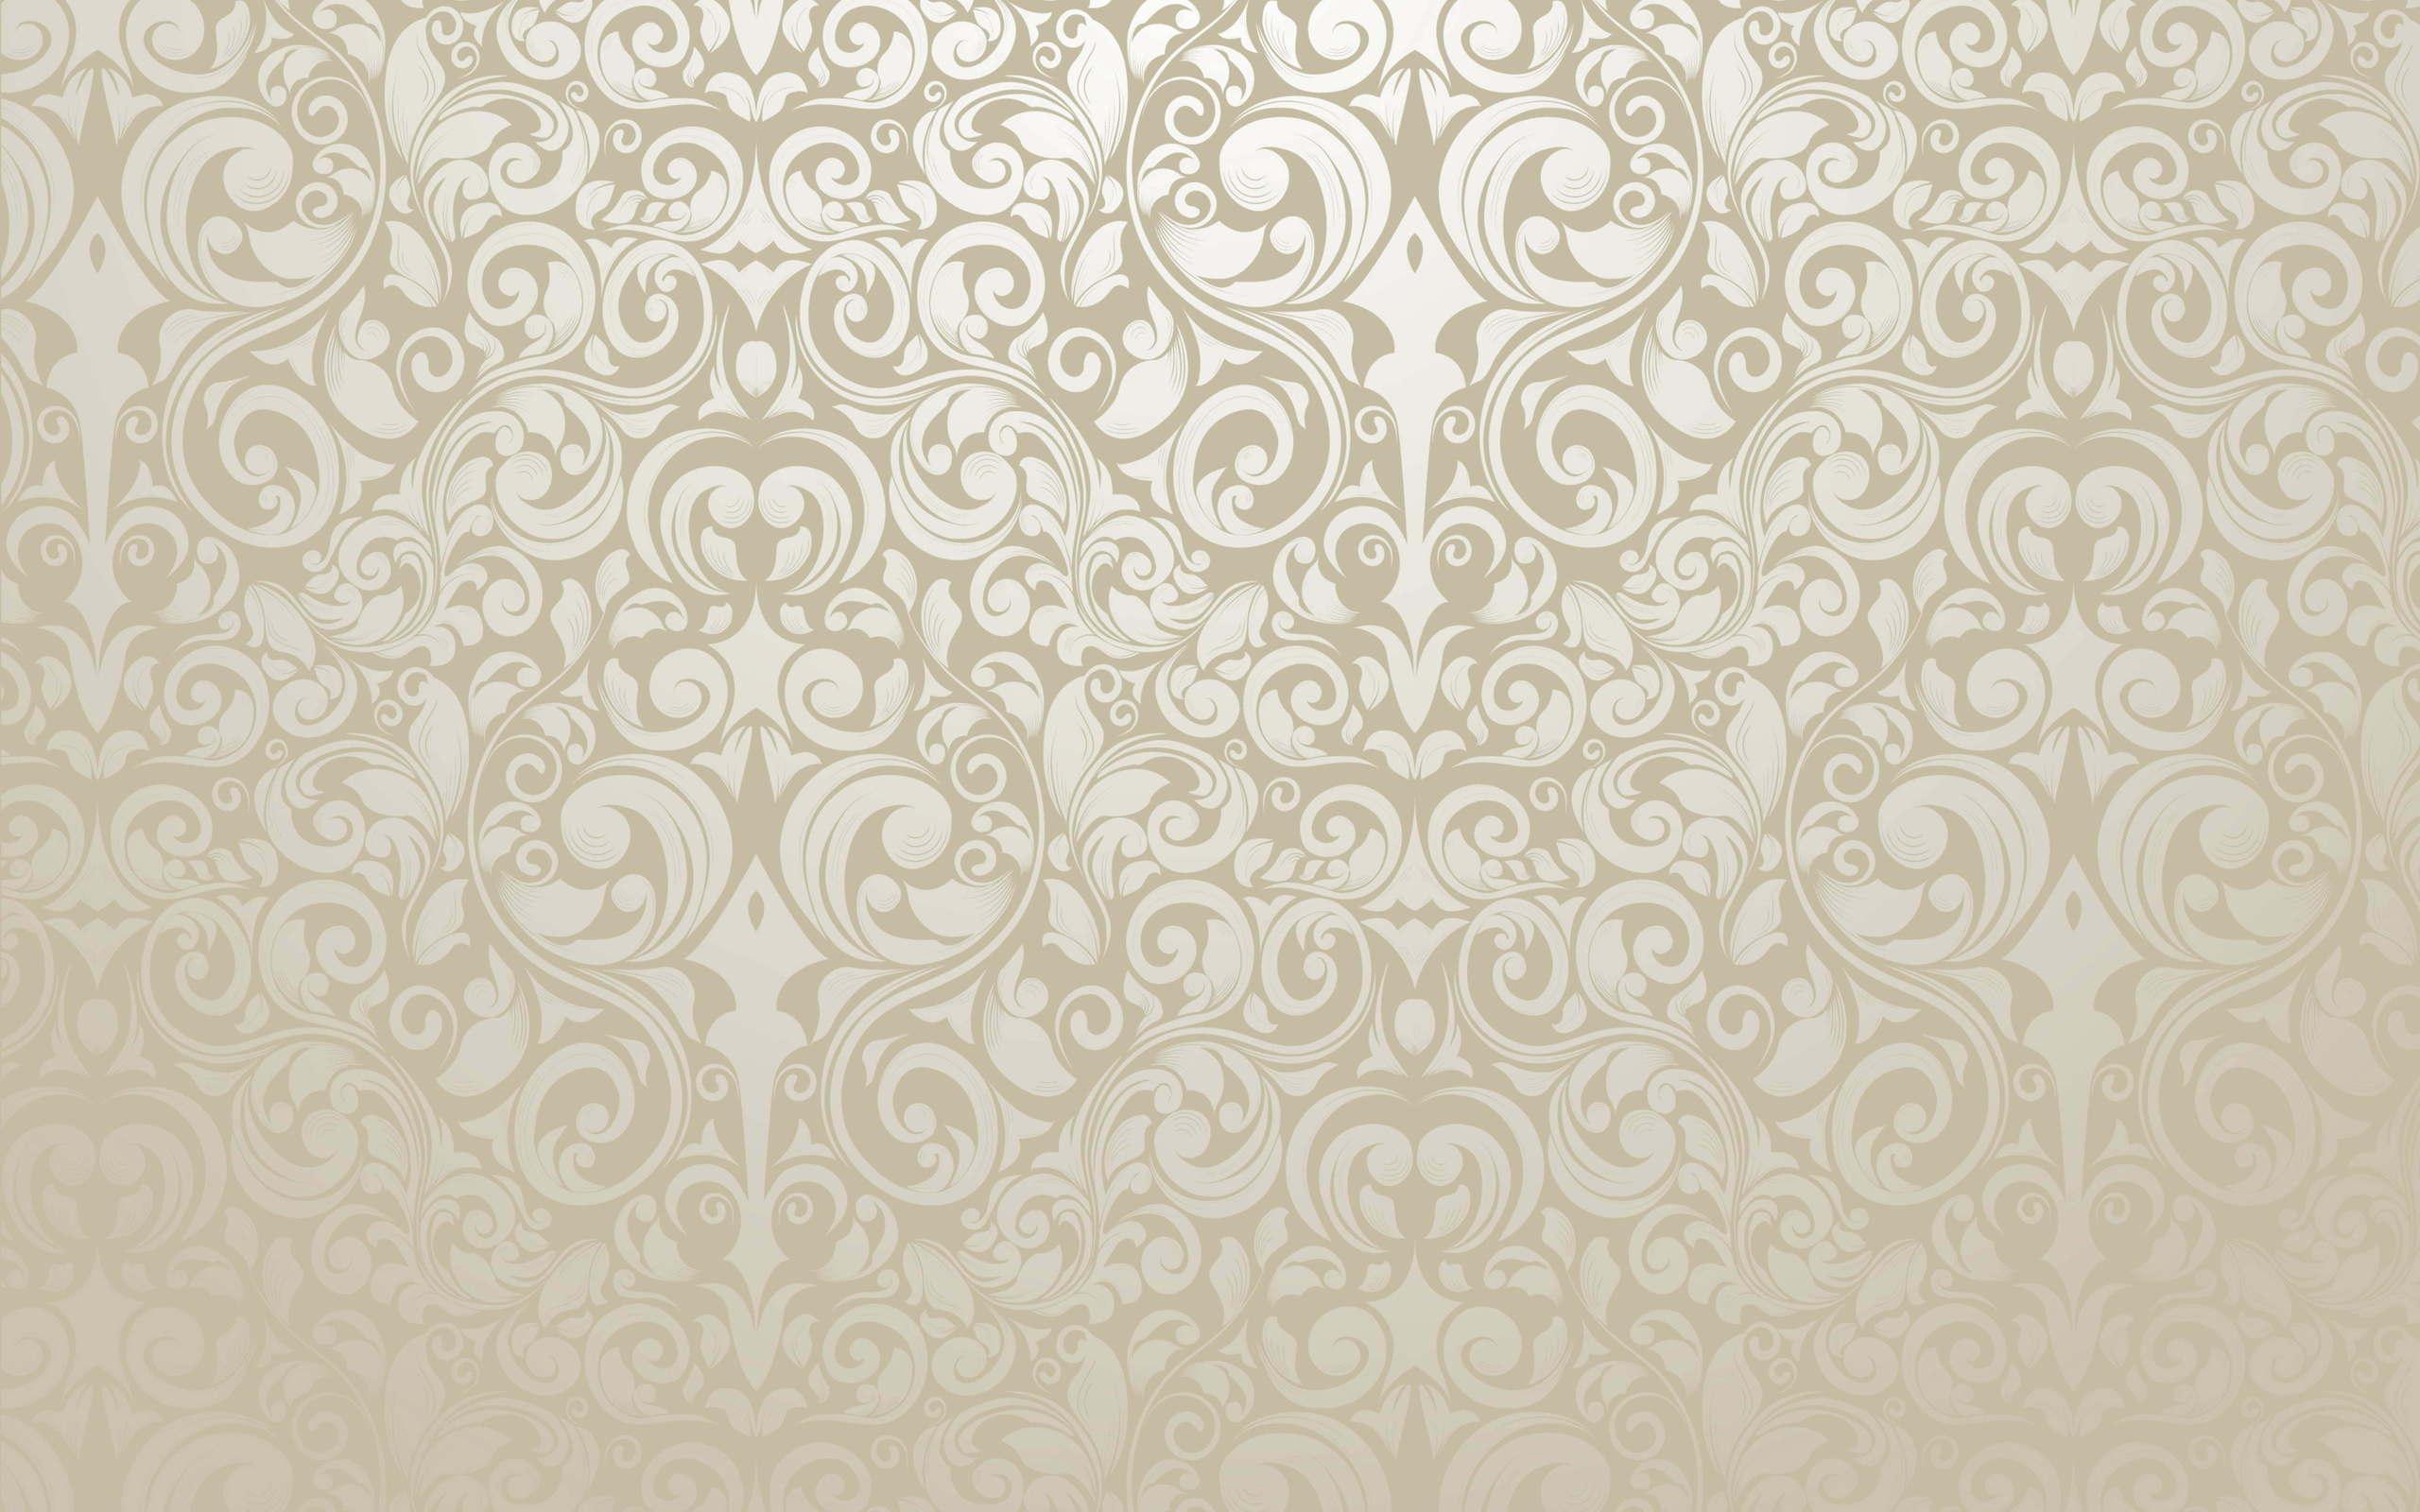 Pattern Wallpaper Windows Download 3425 Wallpaper Cool 2560x1600